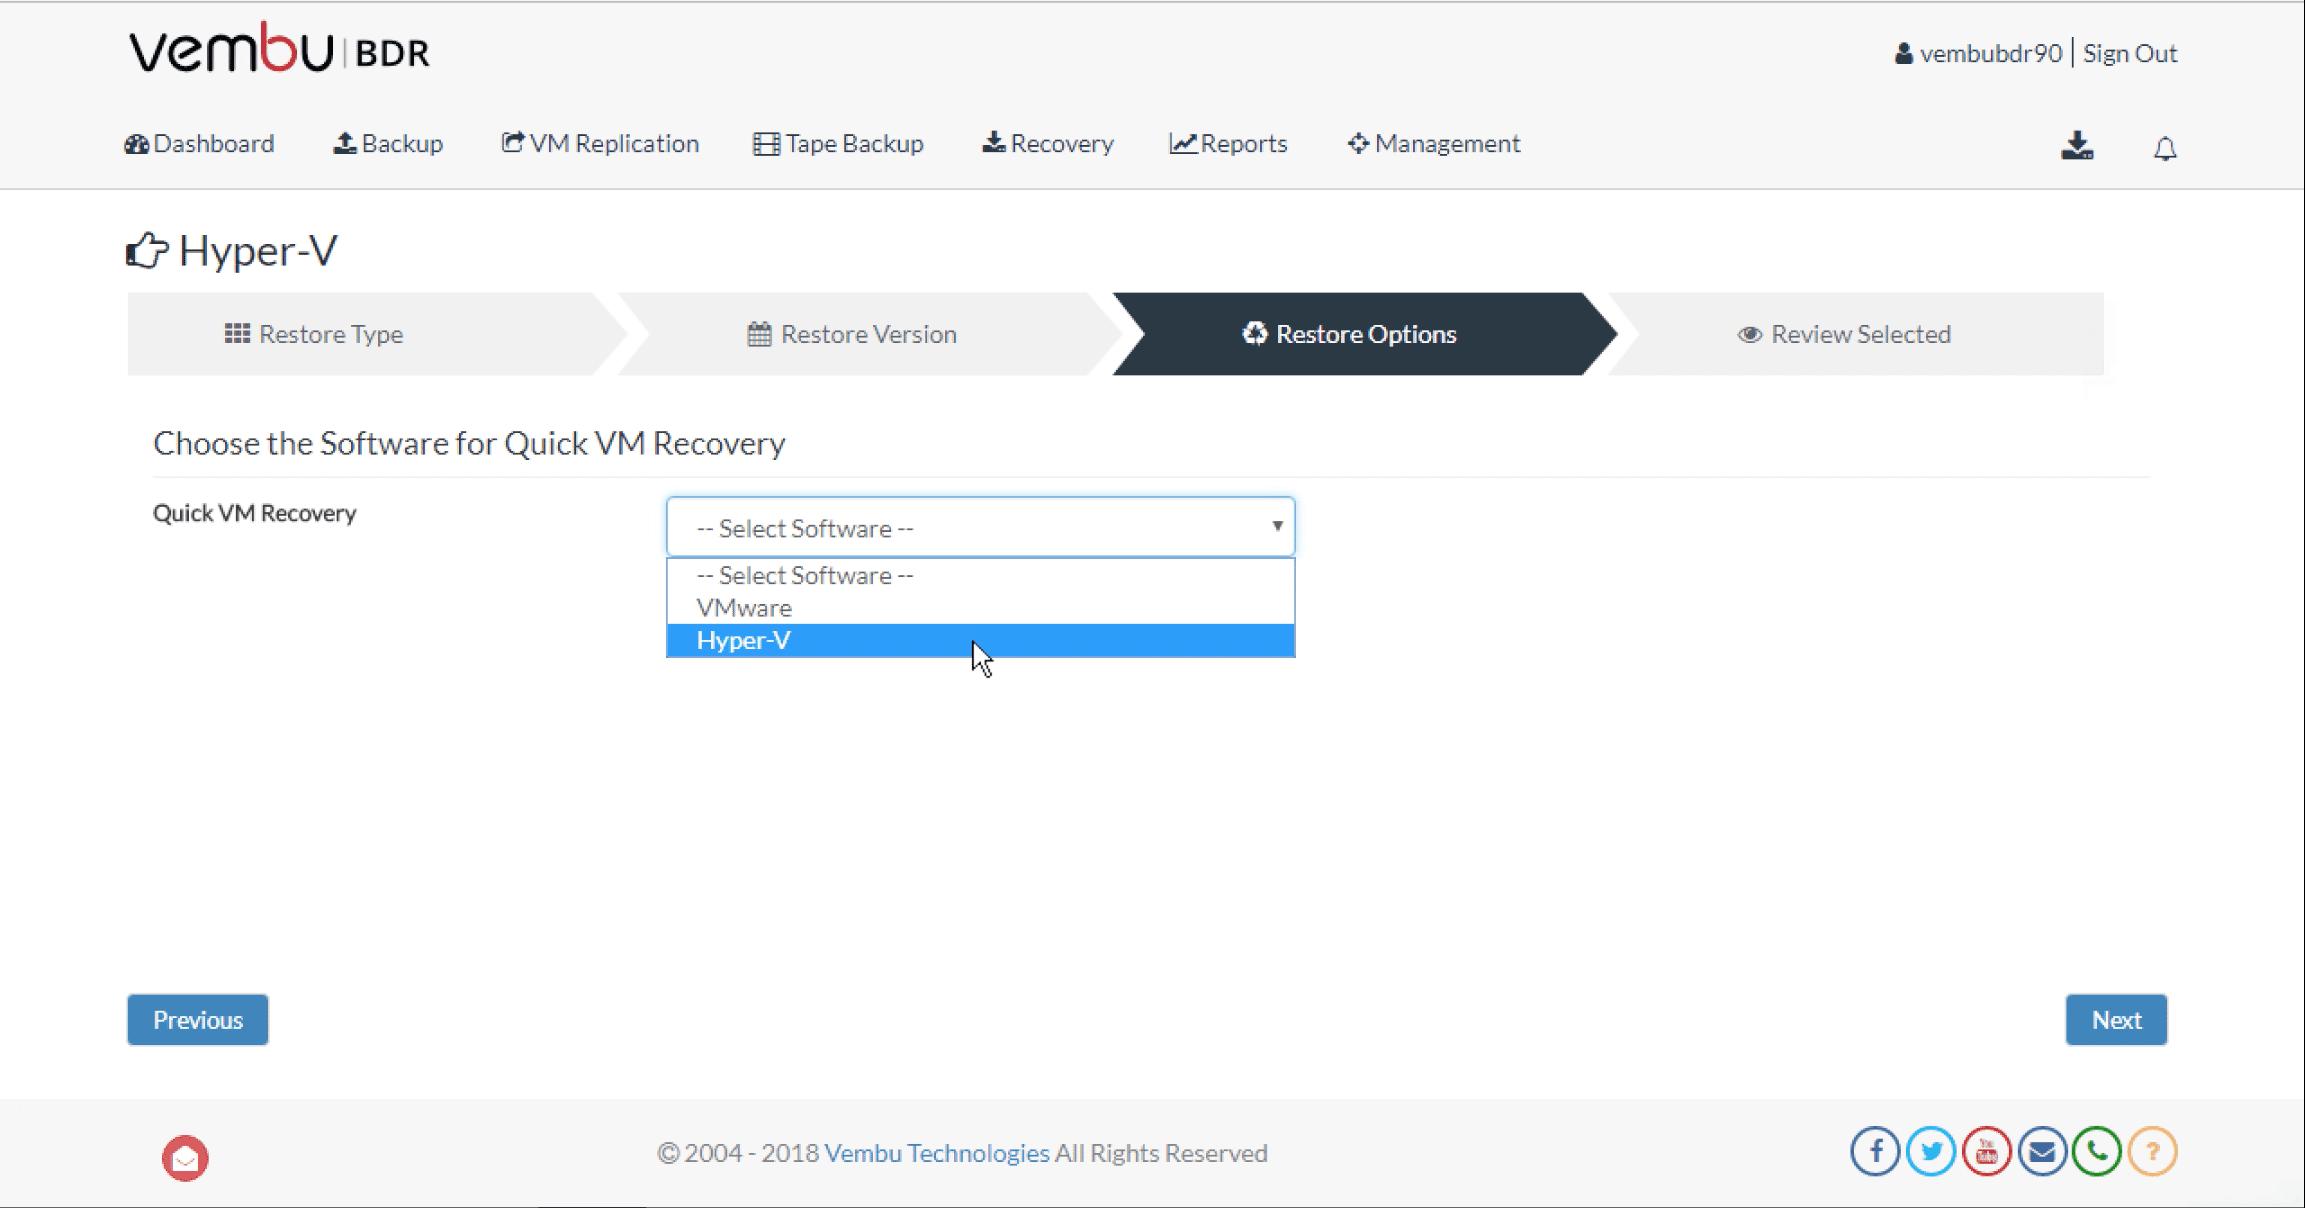 Vembu-BDR-Suite-v3.9.0-allows-Hyper-V-virtual-machine-quick-restores-to-ESXi-hosts